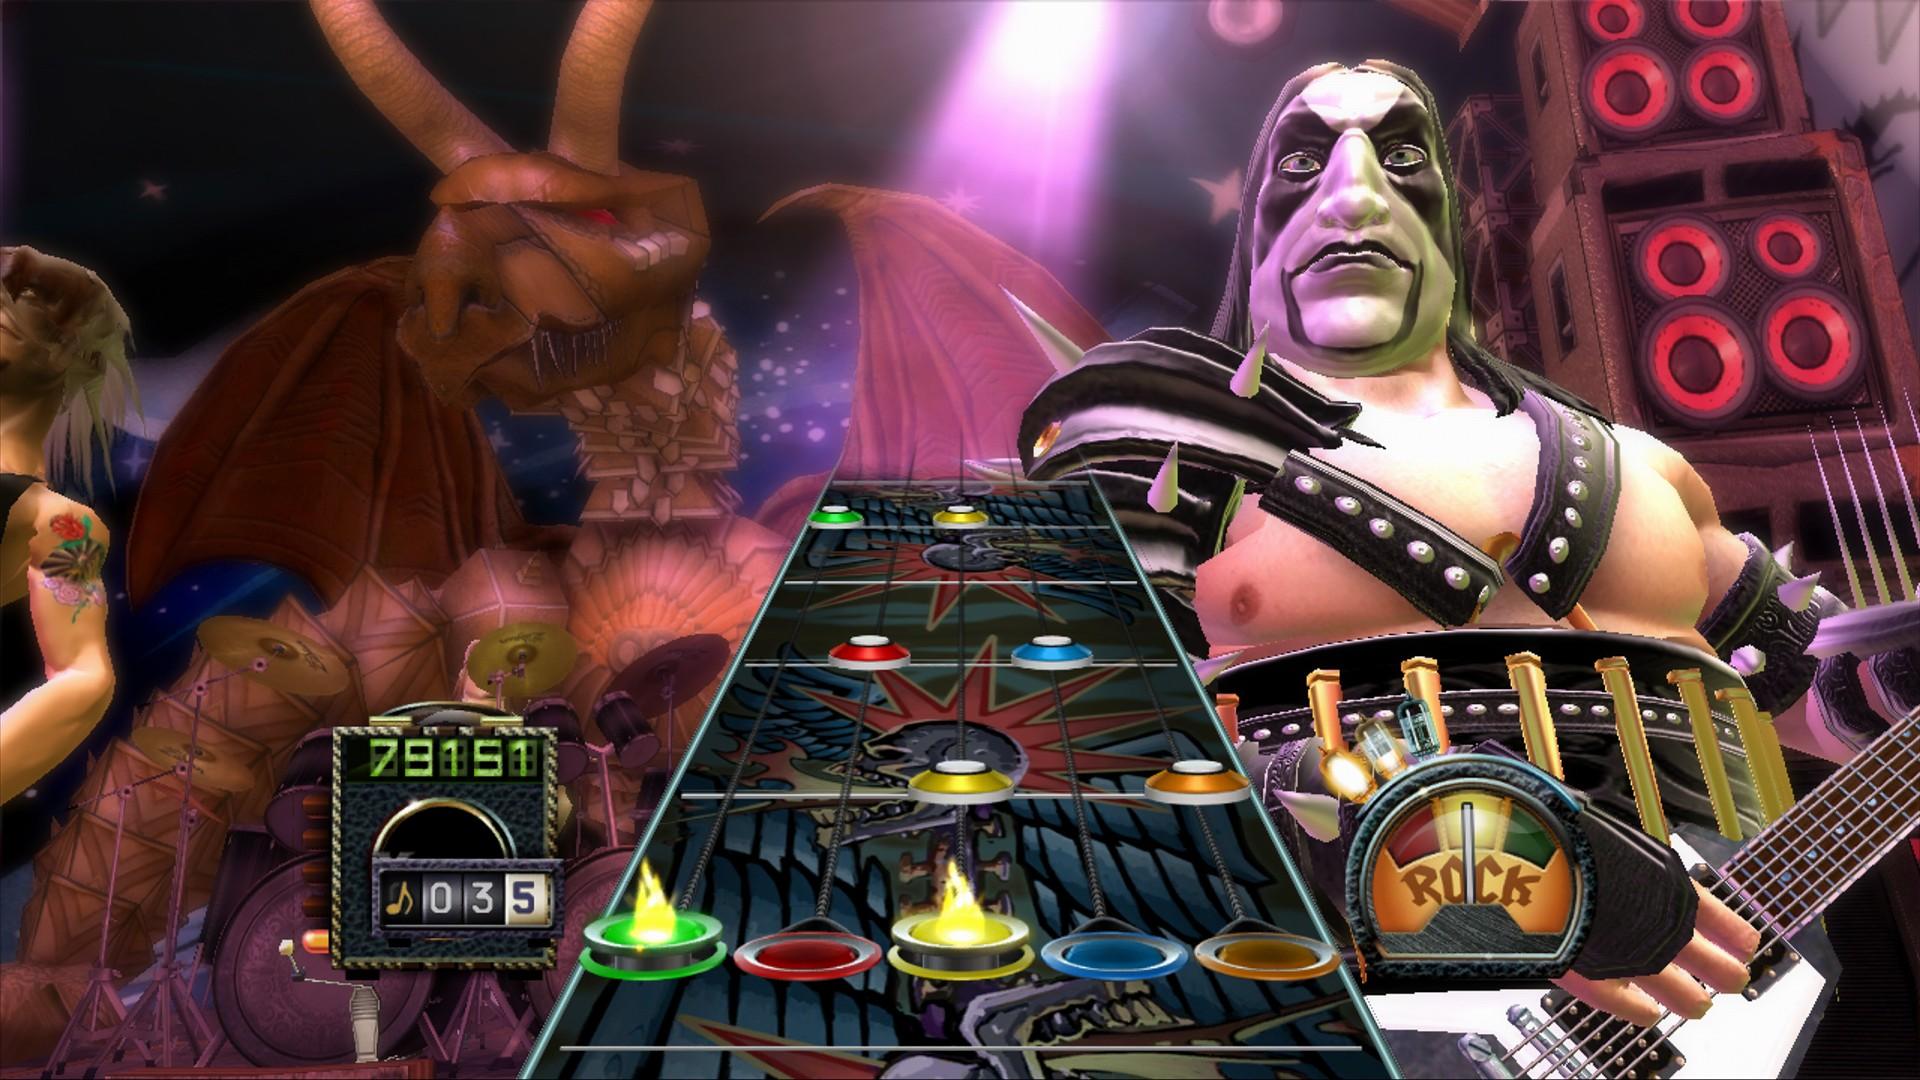 Guitar Hero 3 HD wallpapers, Desktop wallpaper - most viewed